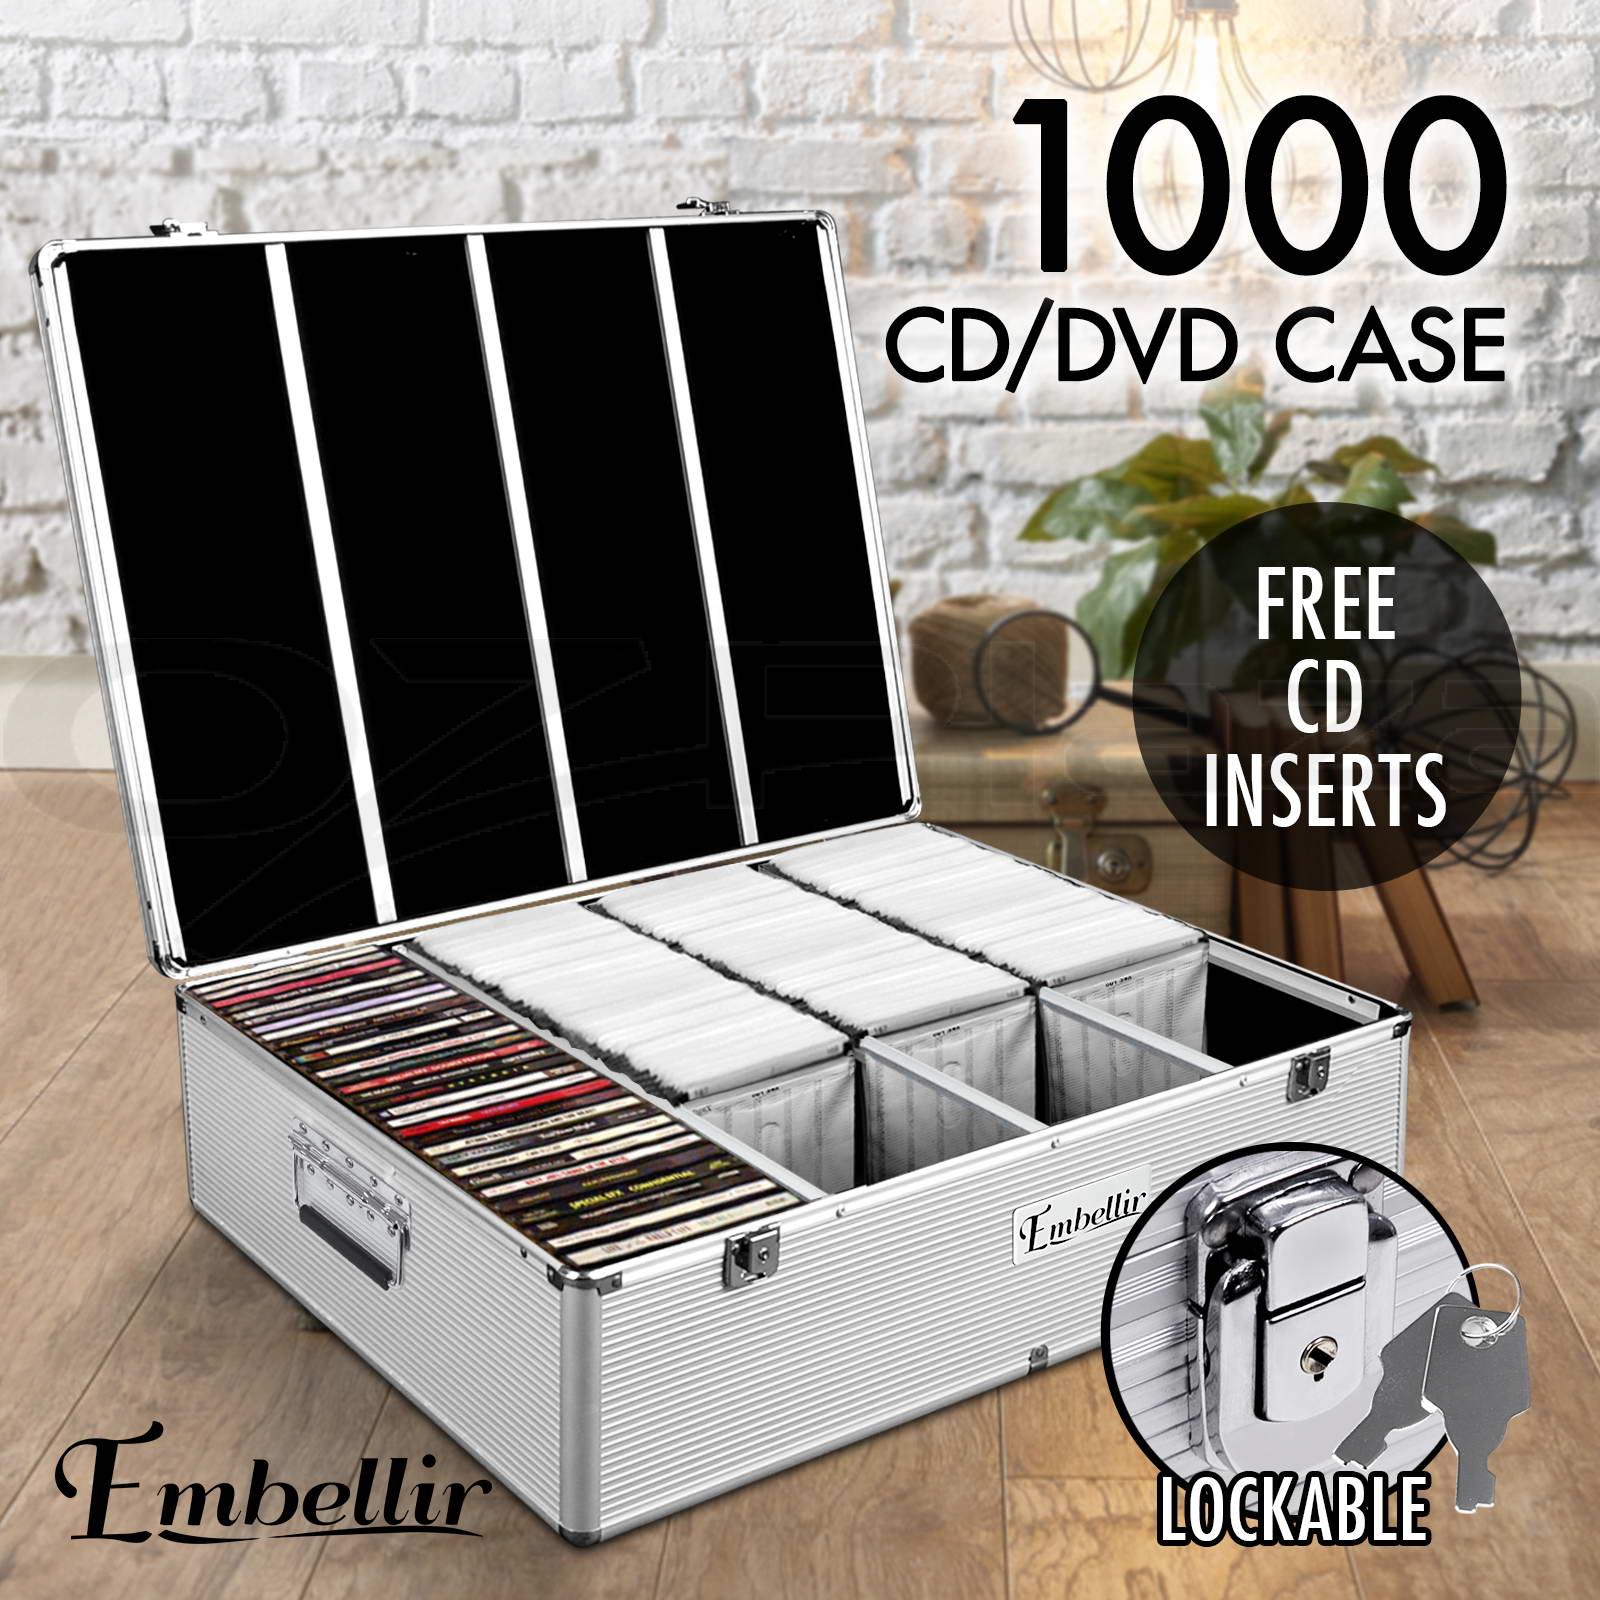 Aluminium Cd Case Dvd Bluray Lock Storage Case Box 240 500 & Dvd Folders Storage - Listitdallas